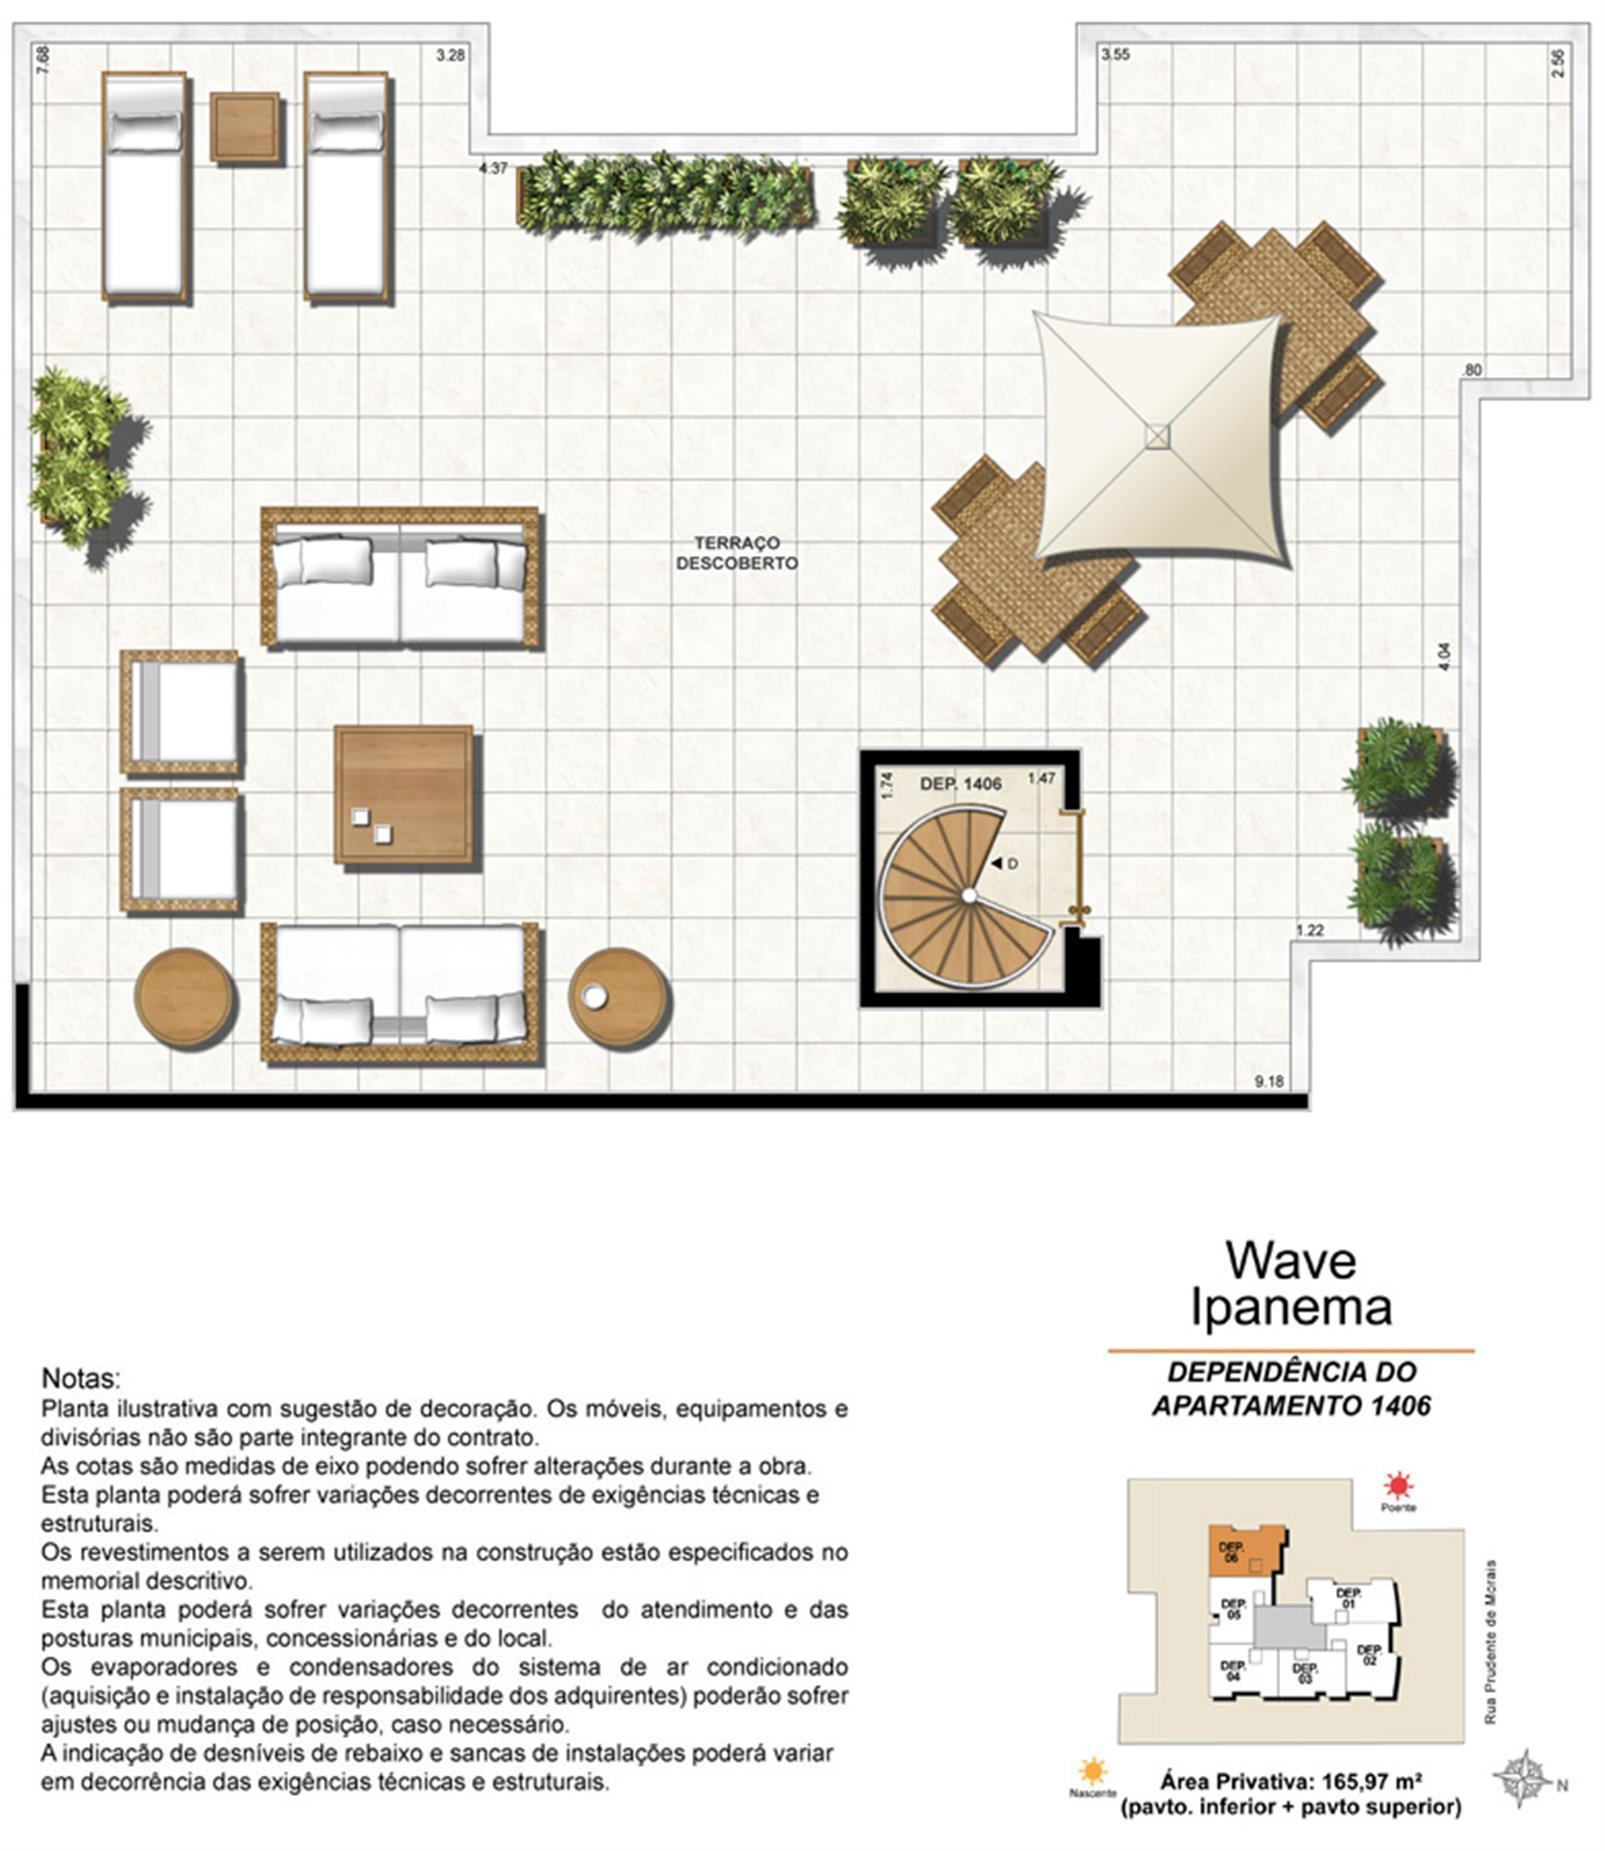 Dependência Cobertura 1406 | Wave Ipanema – Apartamentoem  Ipanema - Rio de Janeiro - Rio de Janeiro